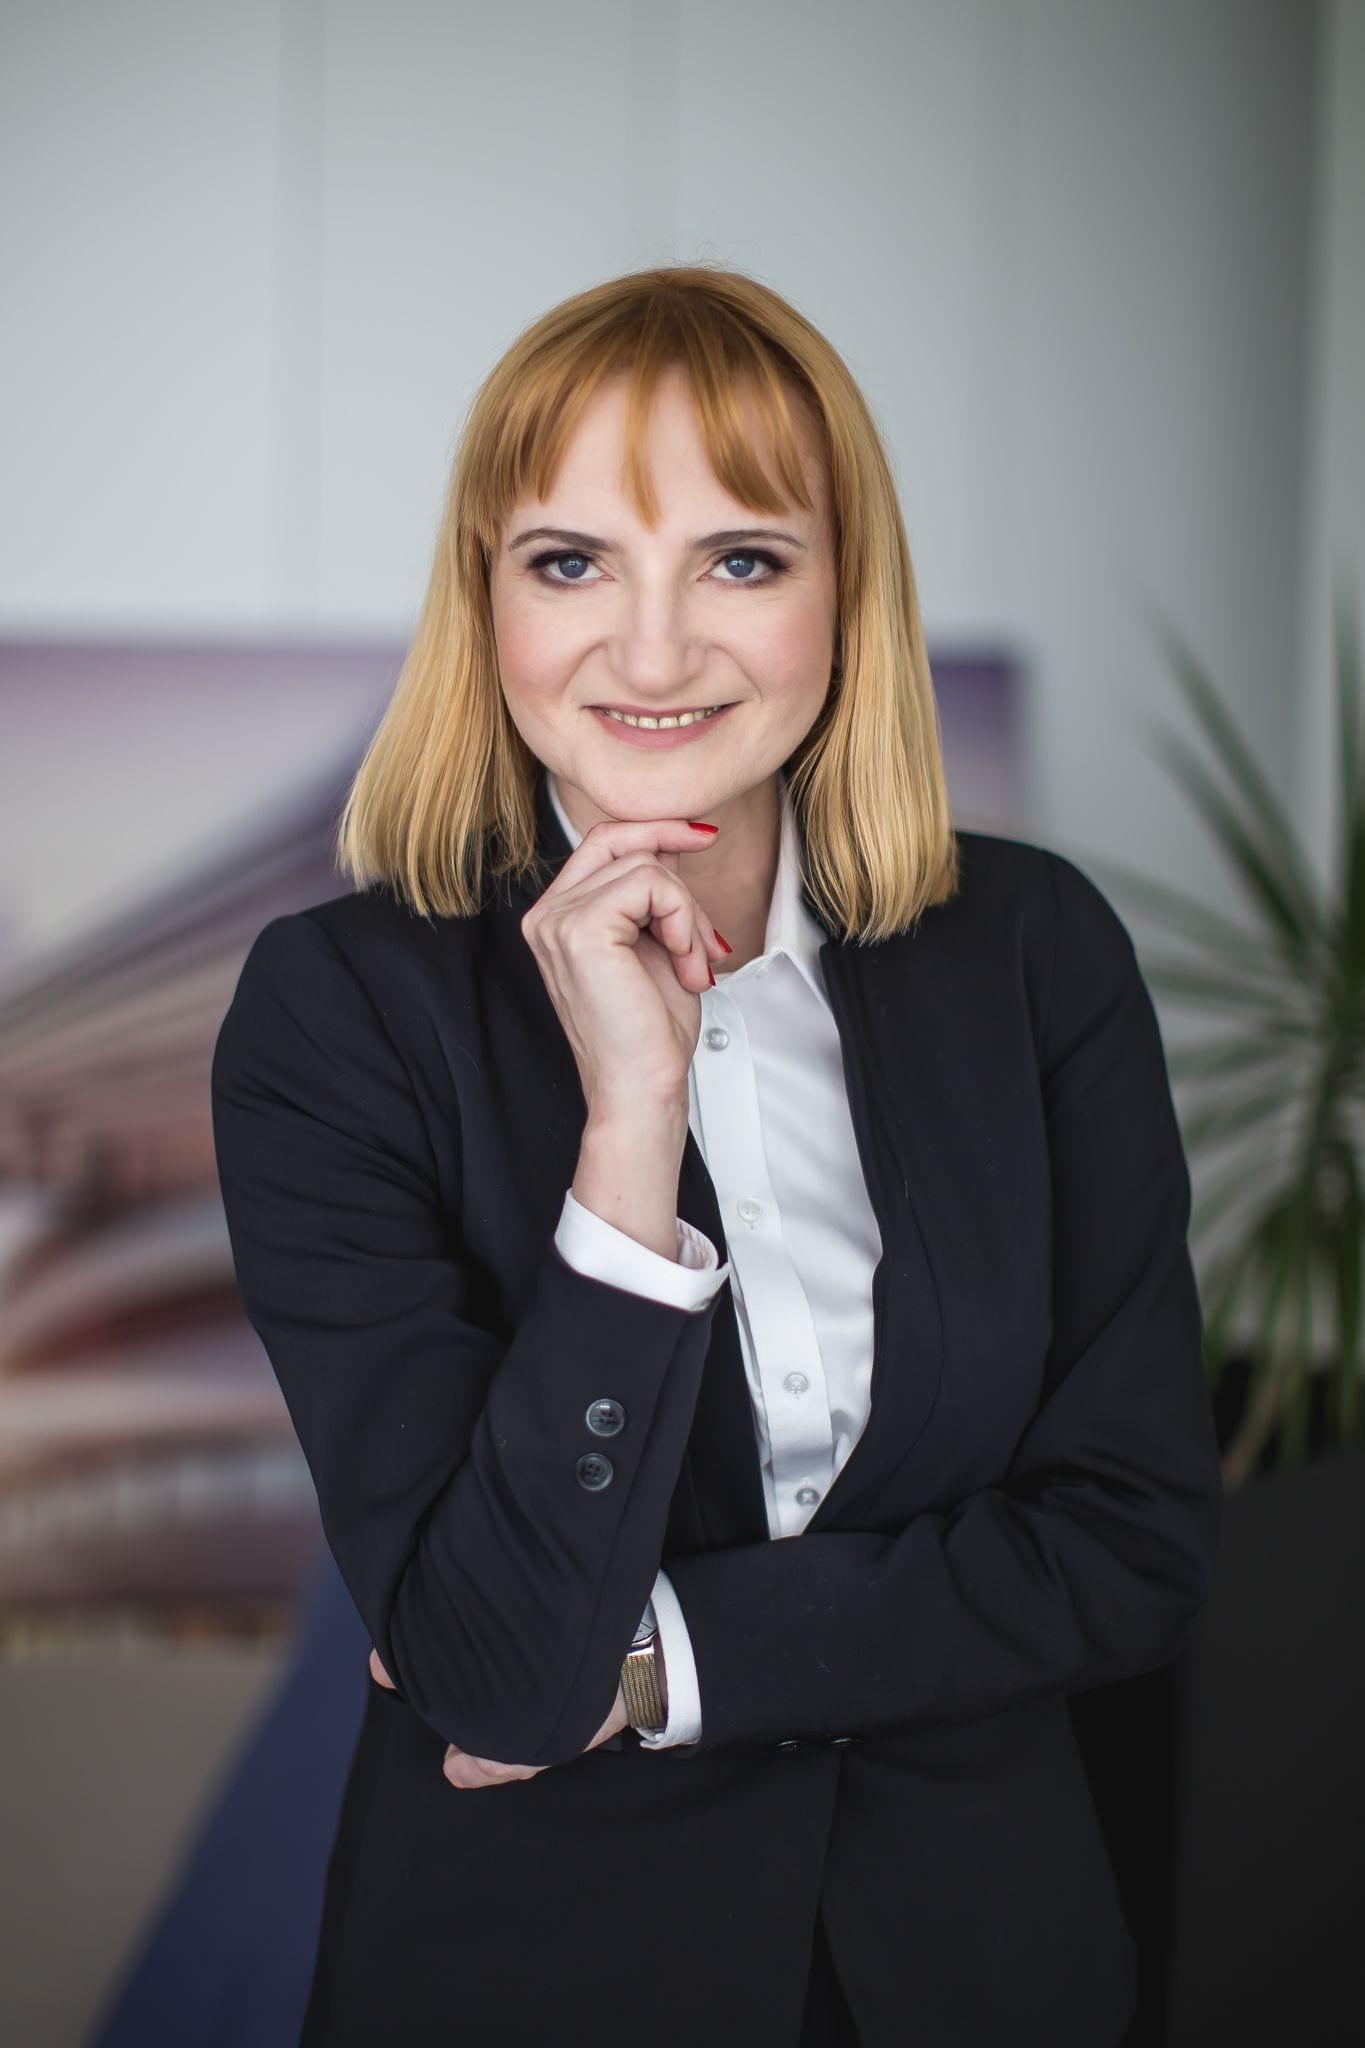 Ewa Stępniewska